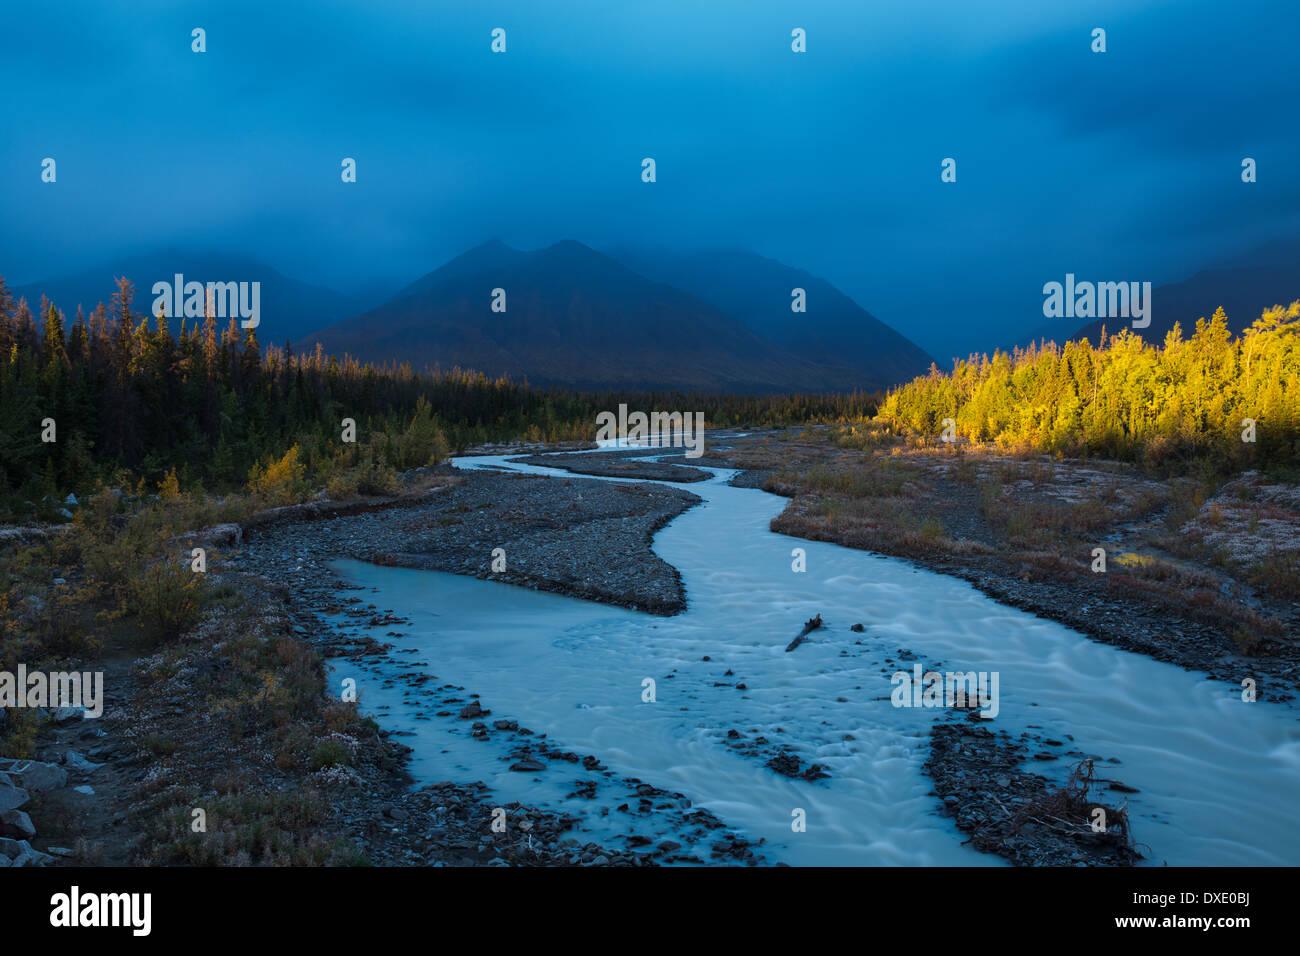 Quill Creek & Auriol Bereich St. Elias Mountains, Yukon Territorien, Kanada Stockbild